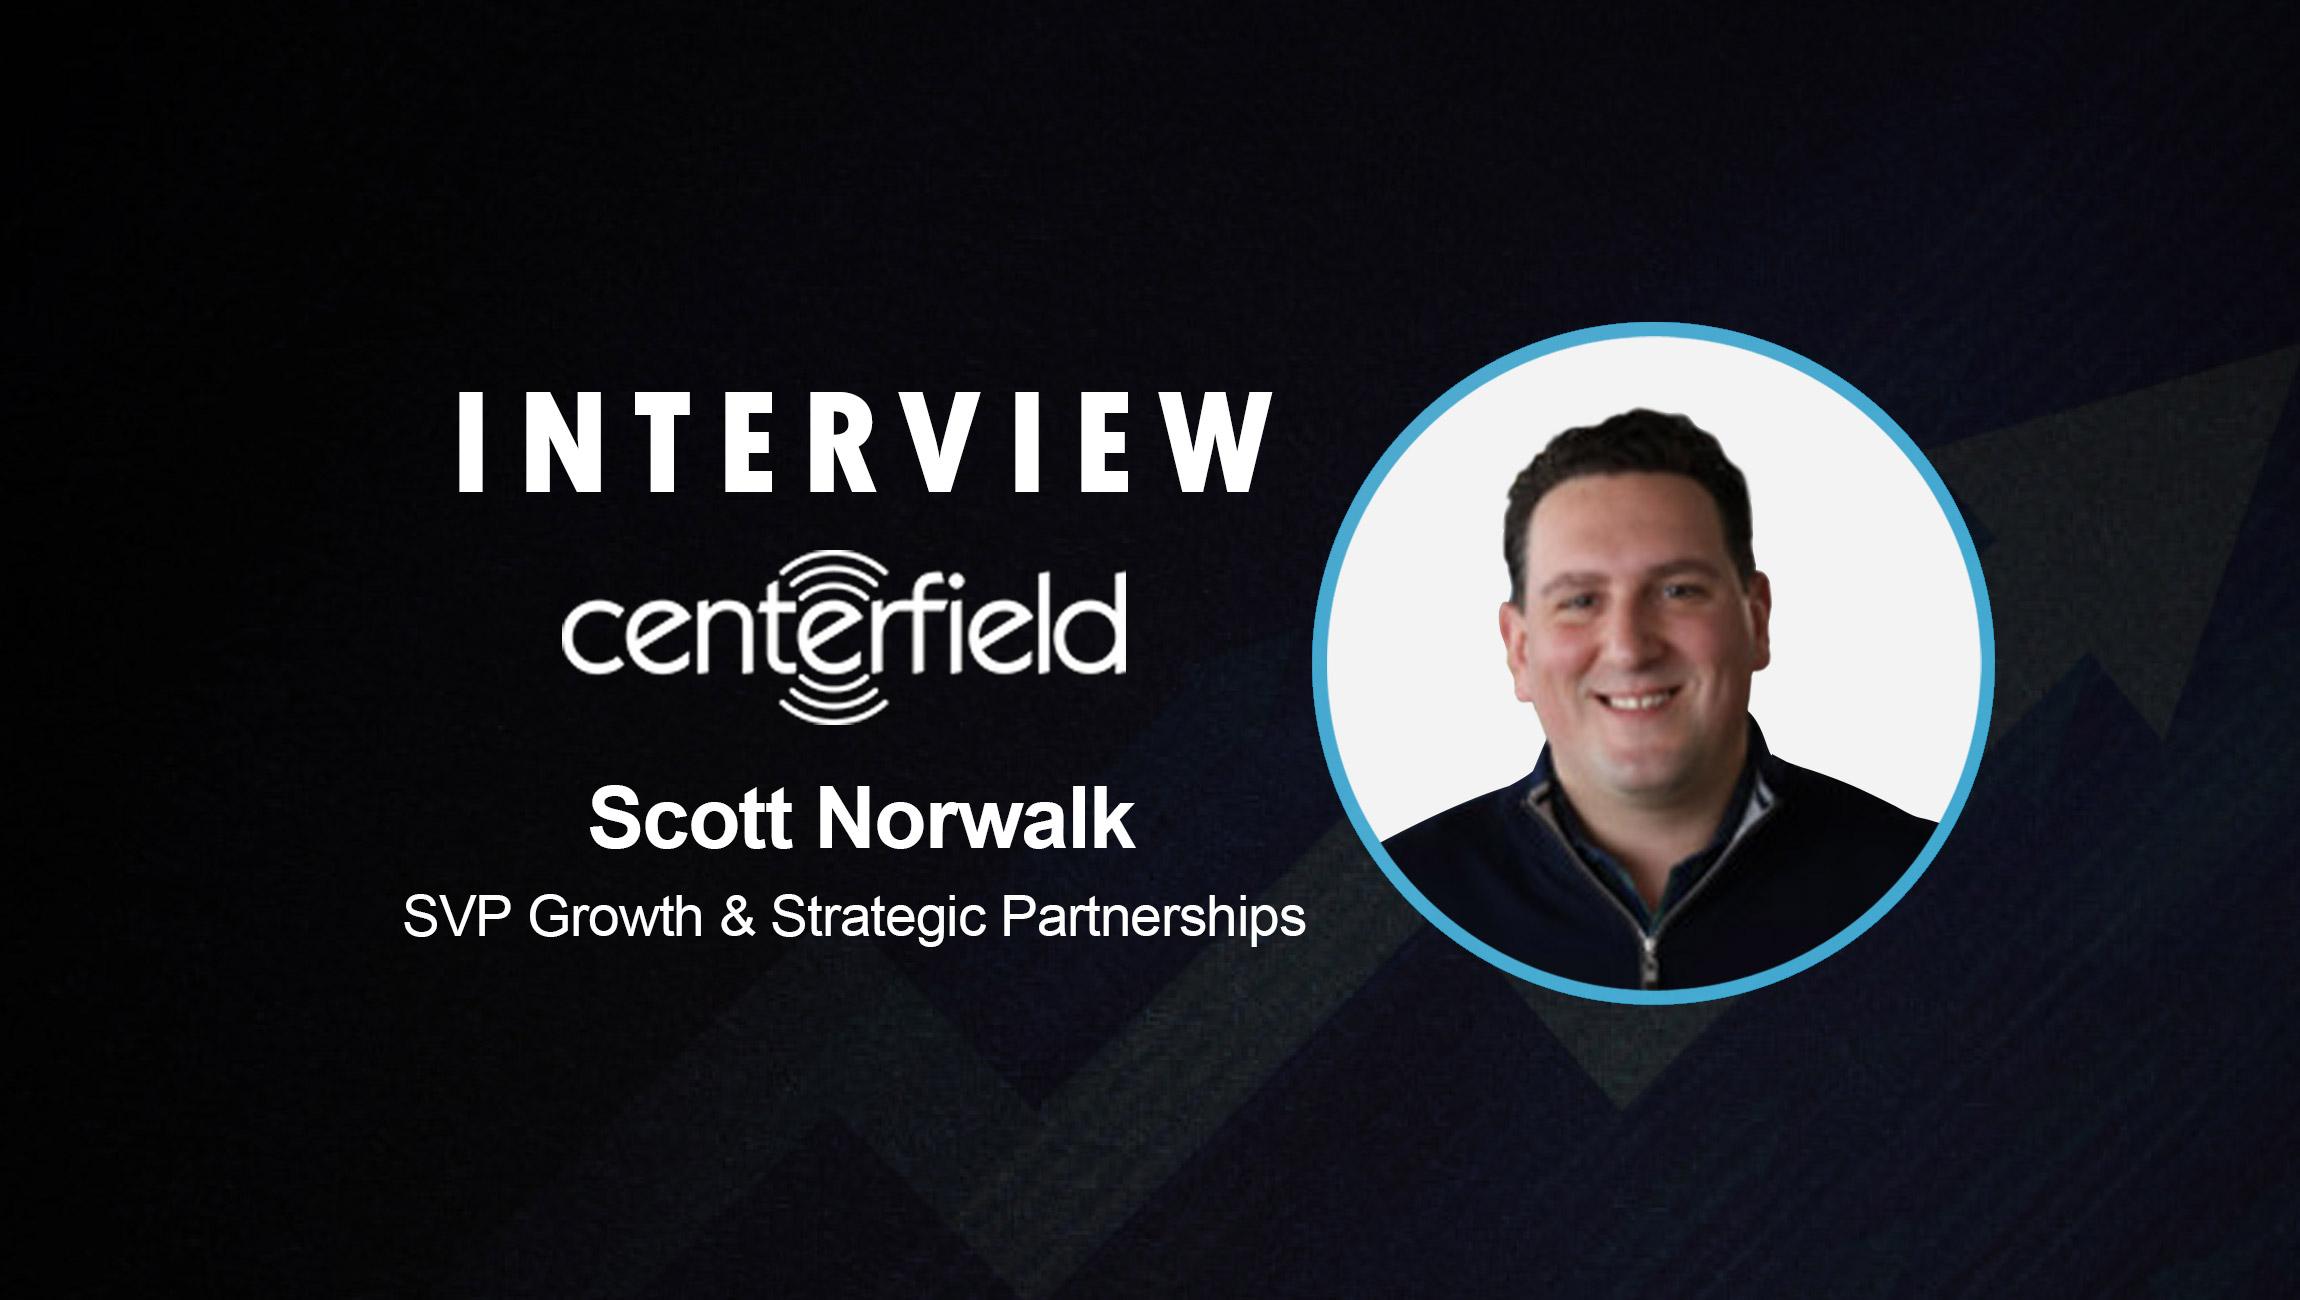 SalesTechStar Interview with Scott Norwalk, SVP Growth & Strategic Partnerships at Centerfield Corporation